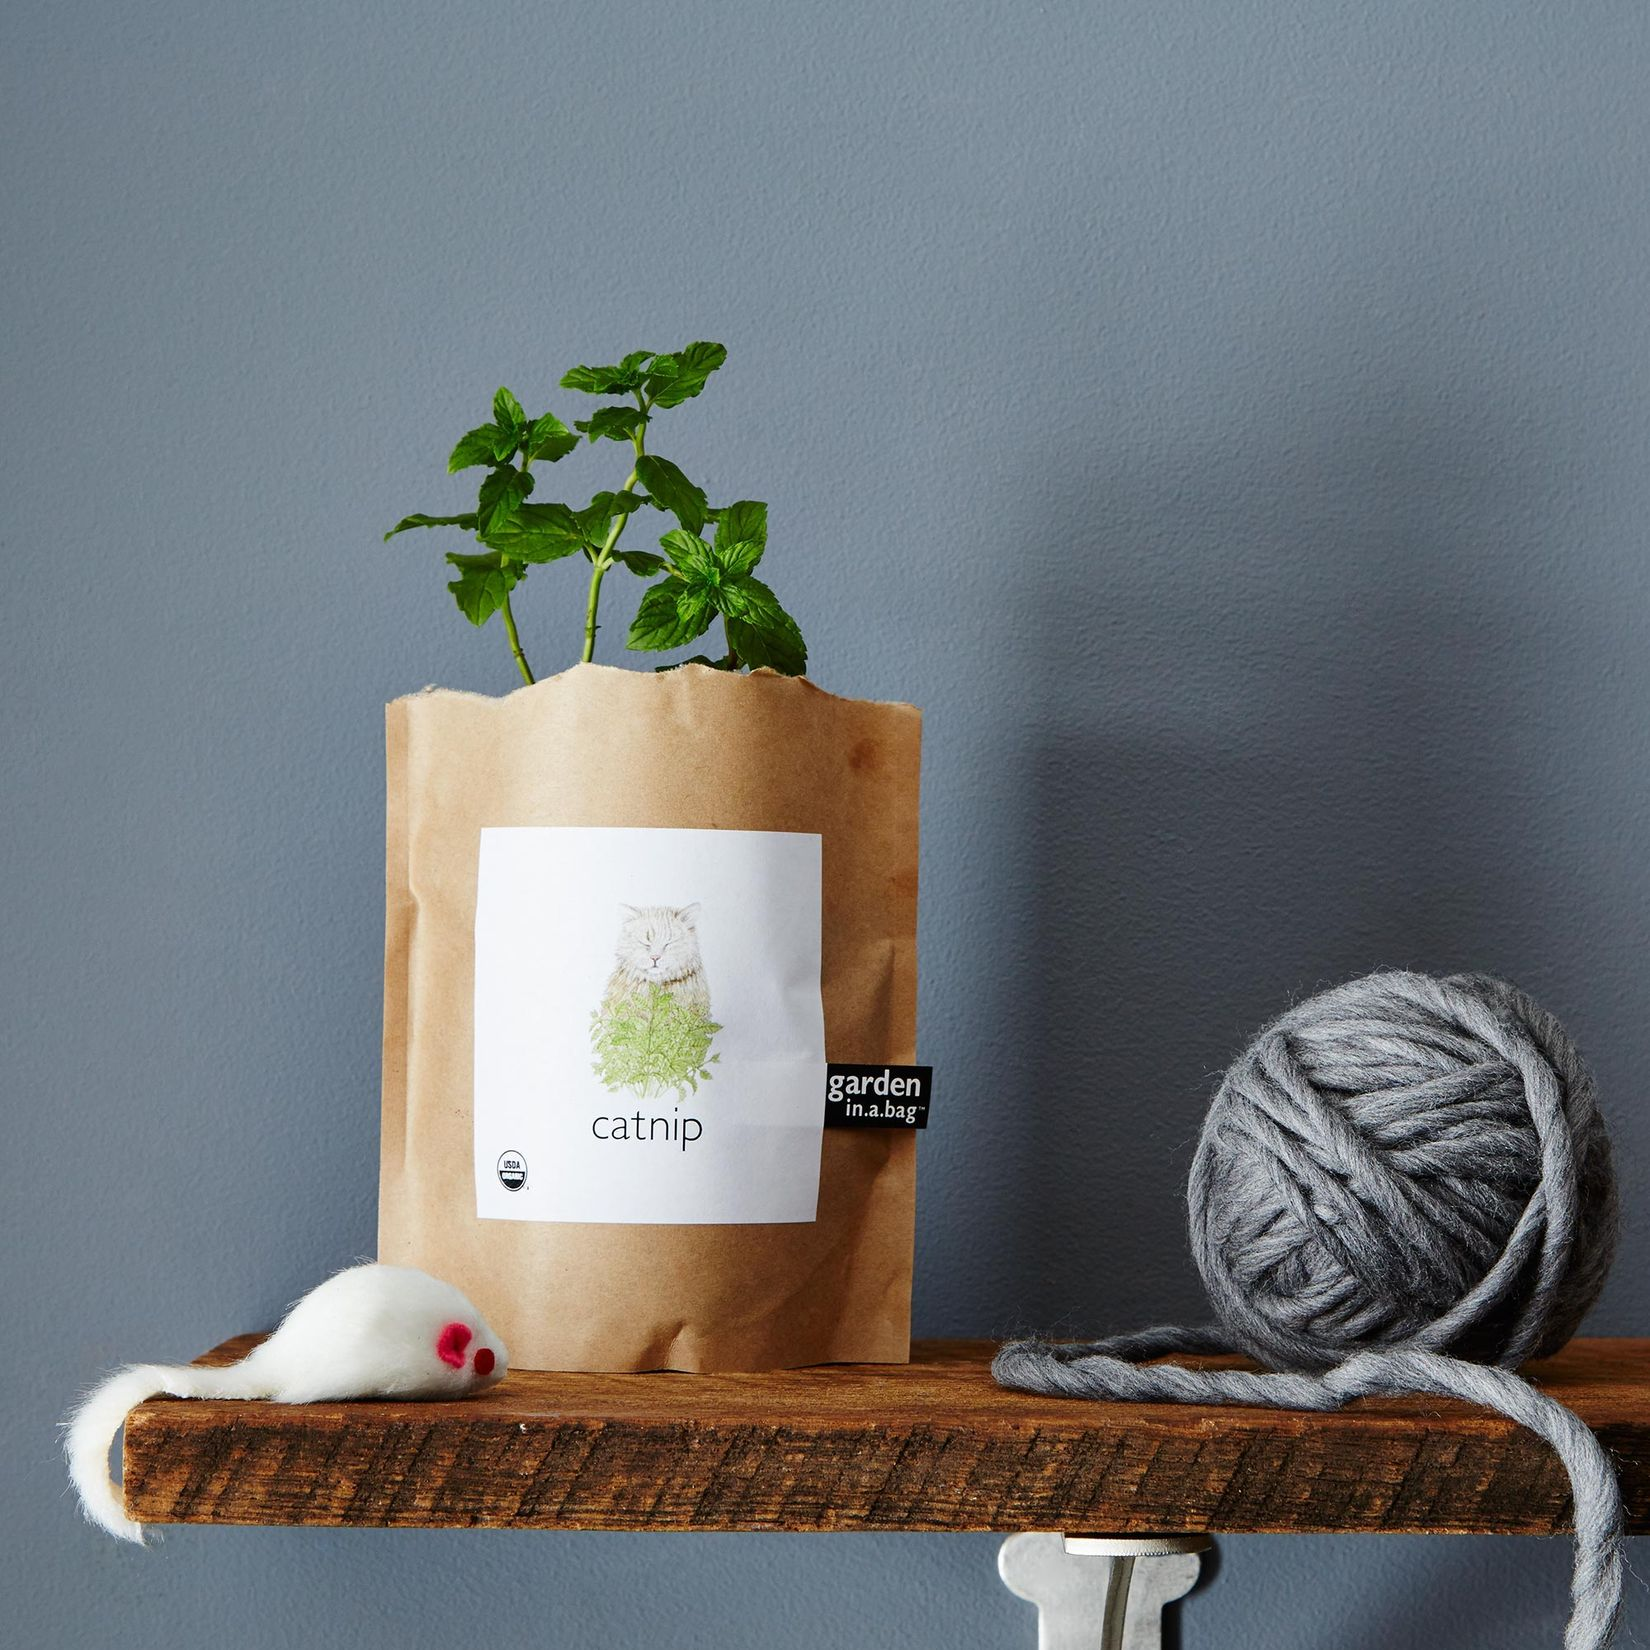 garden in a bag catnip